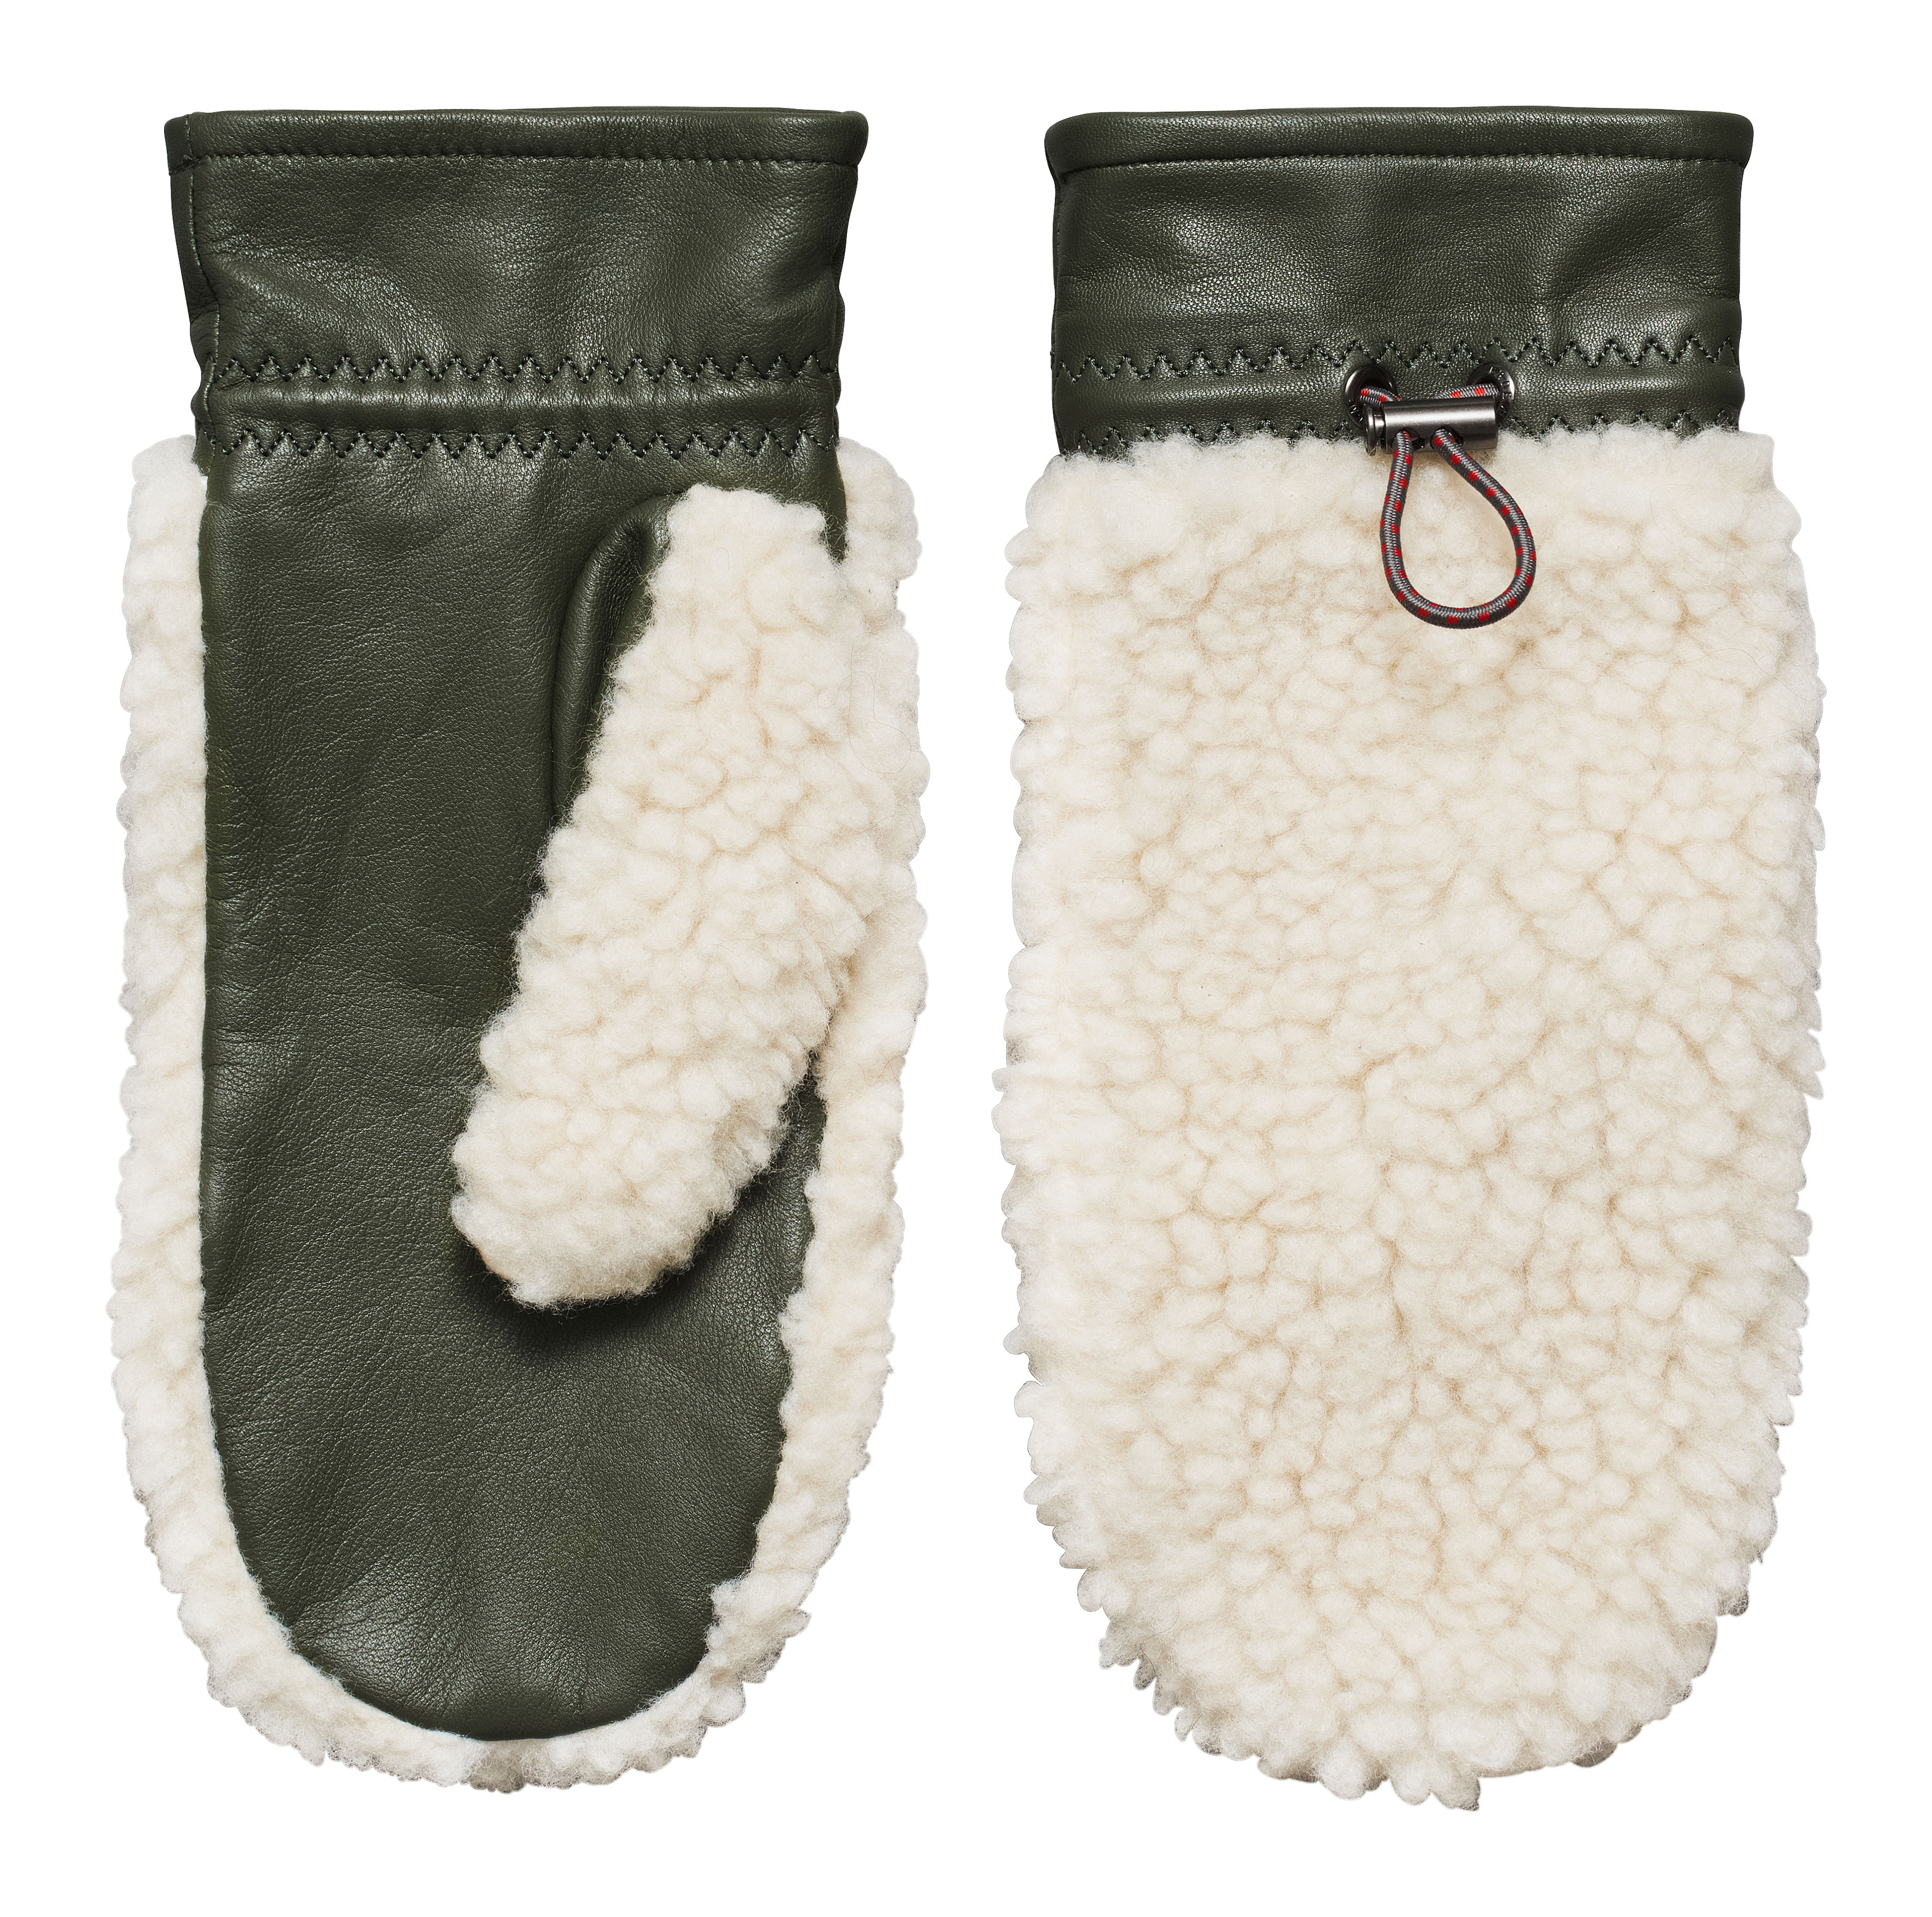 H&M _Erdem_Men_Danny_Gloves_49,99EUR